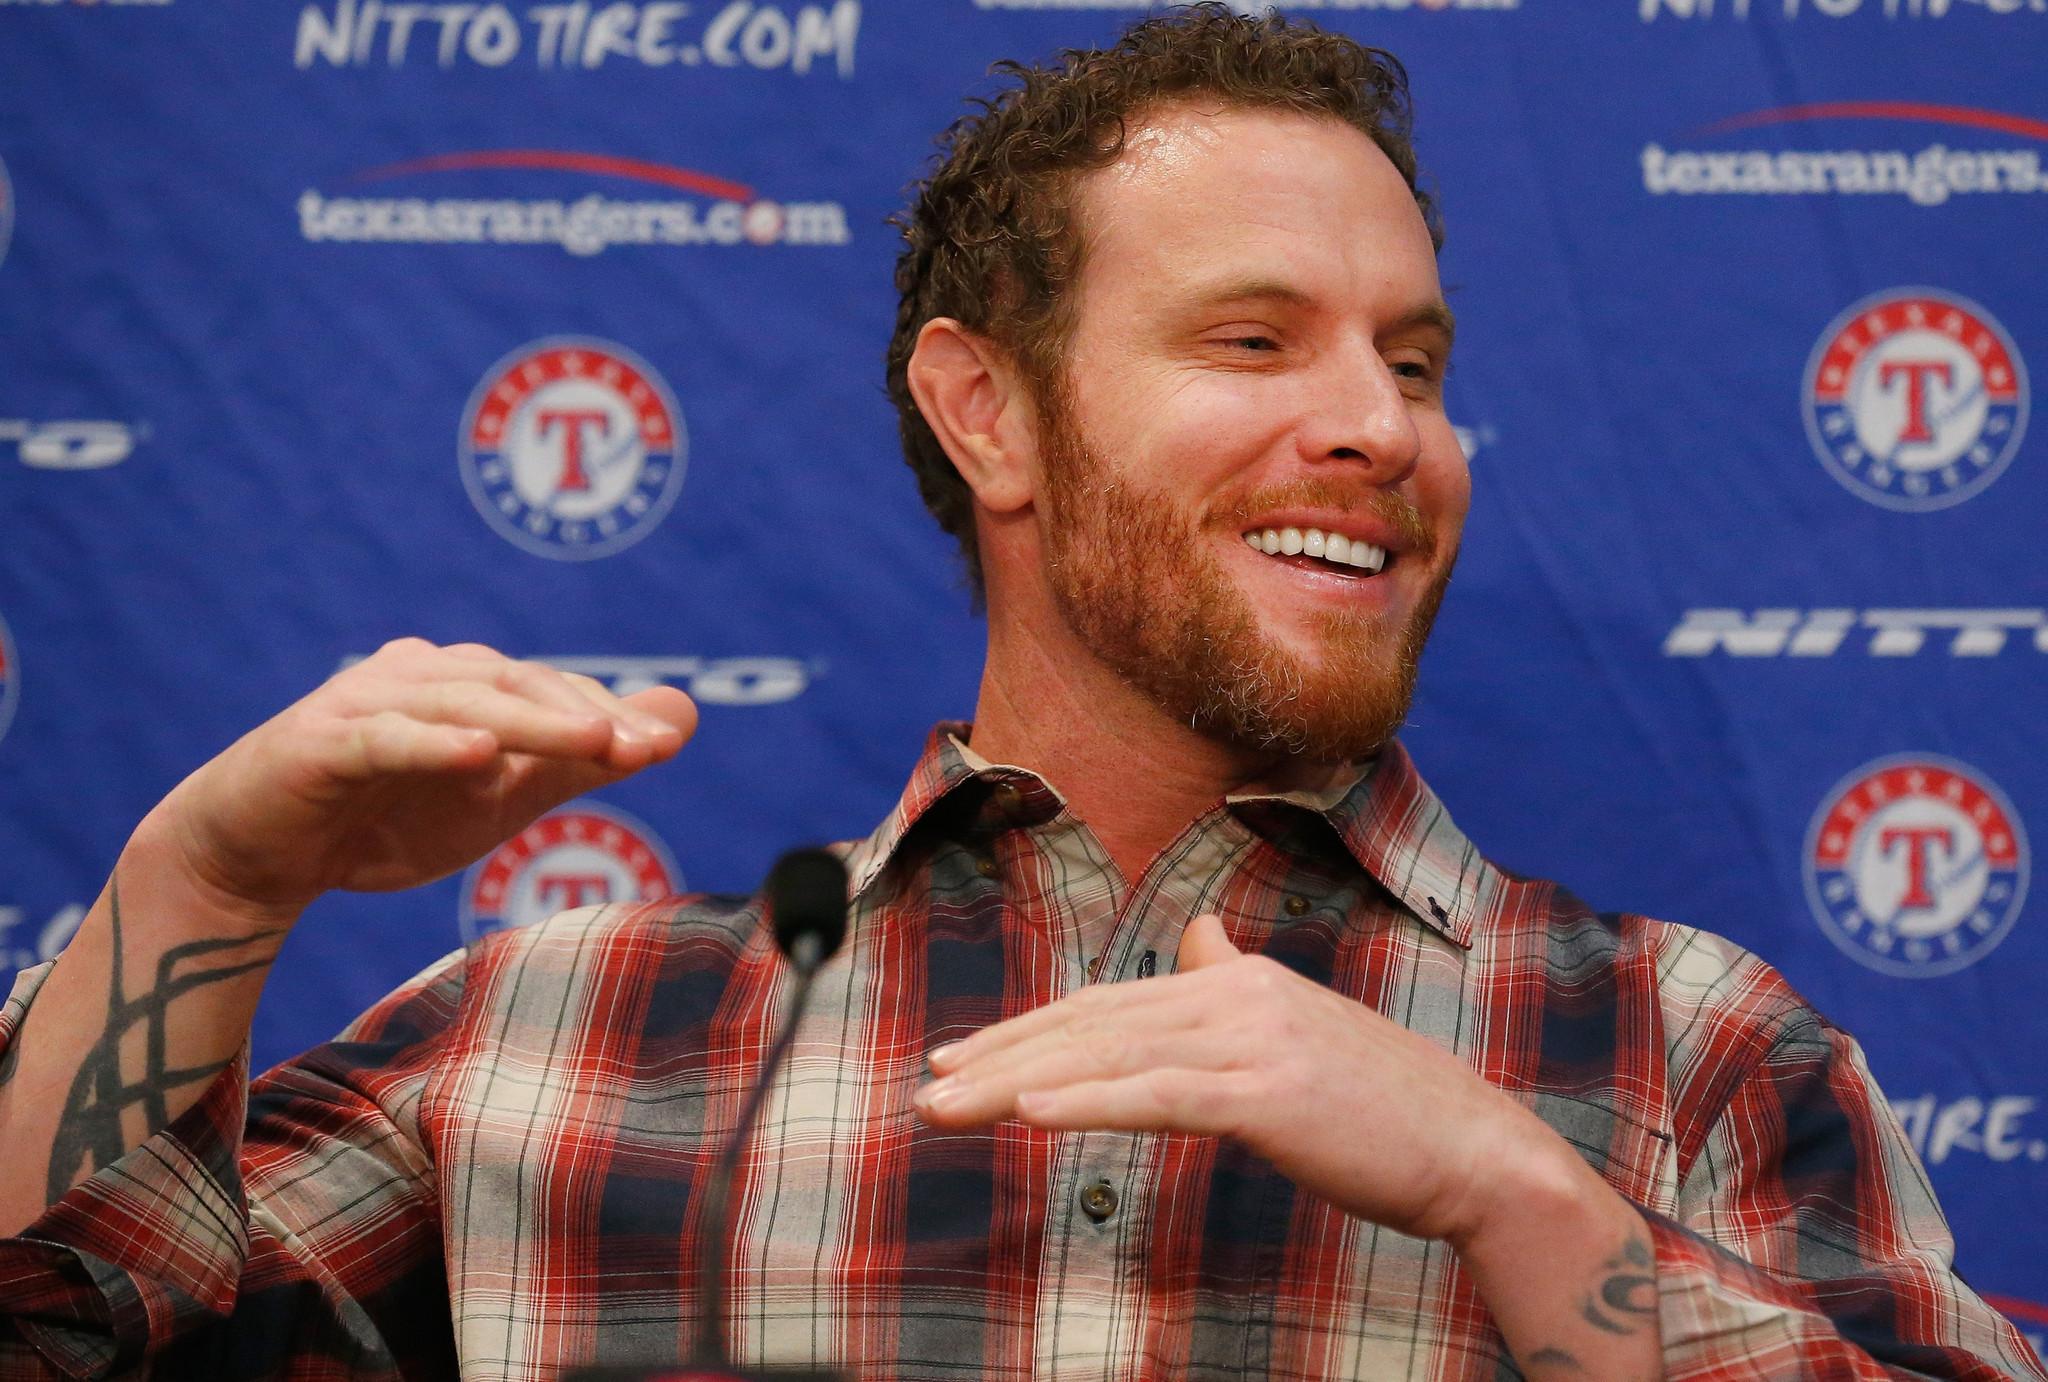 josh hamilton Rangers release injured outfielder josh hamilton, keep door open for return   josh hamilton beats yankees in bottom of 9th inning as texas rangers win 7-6.